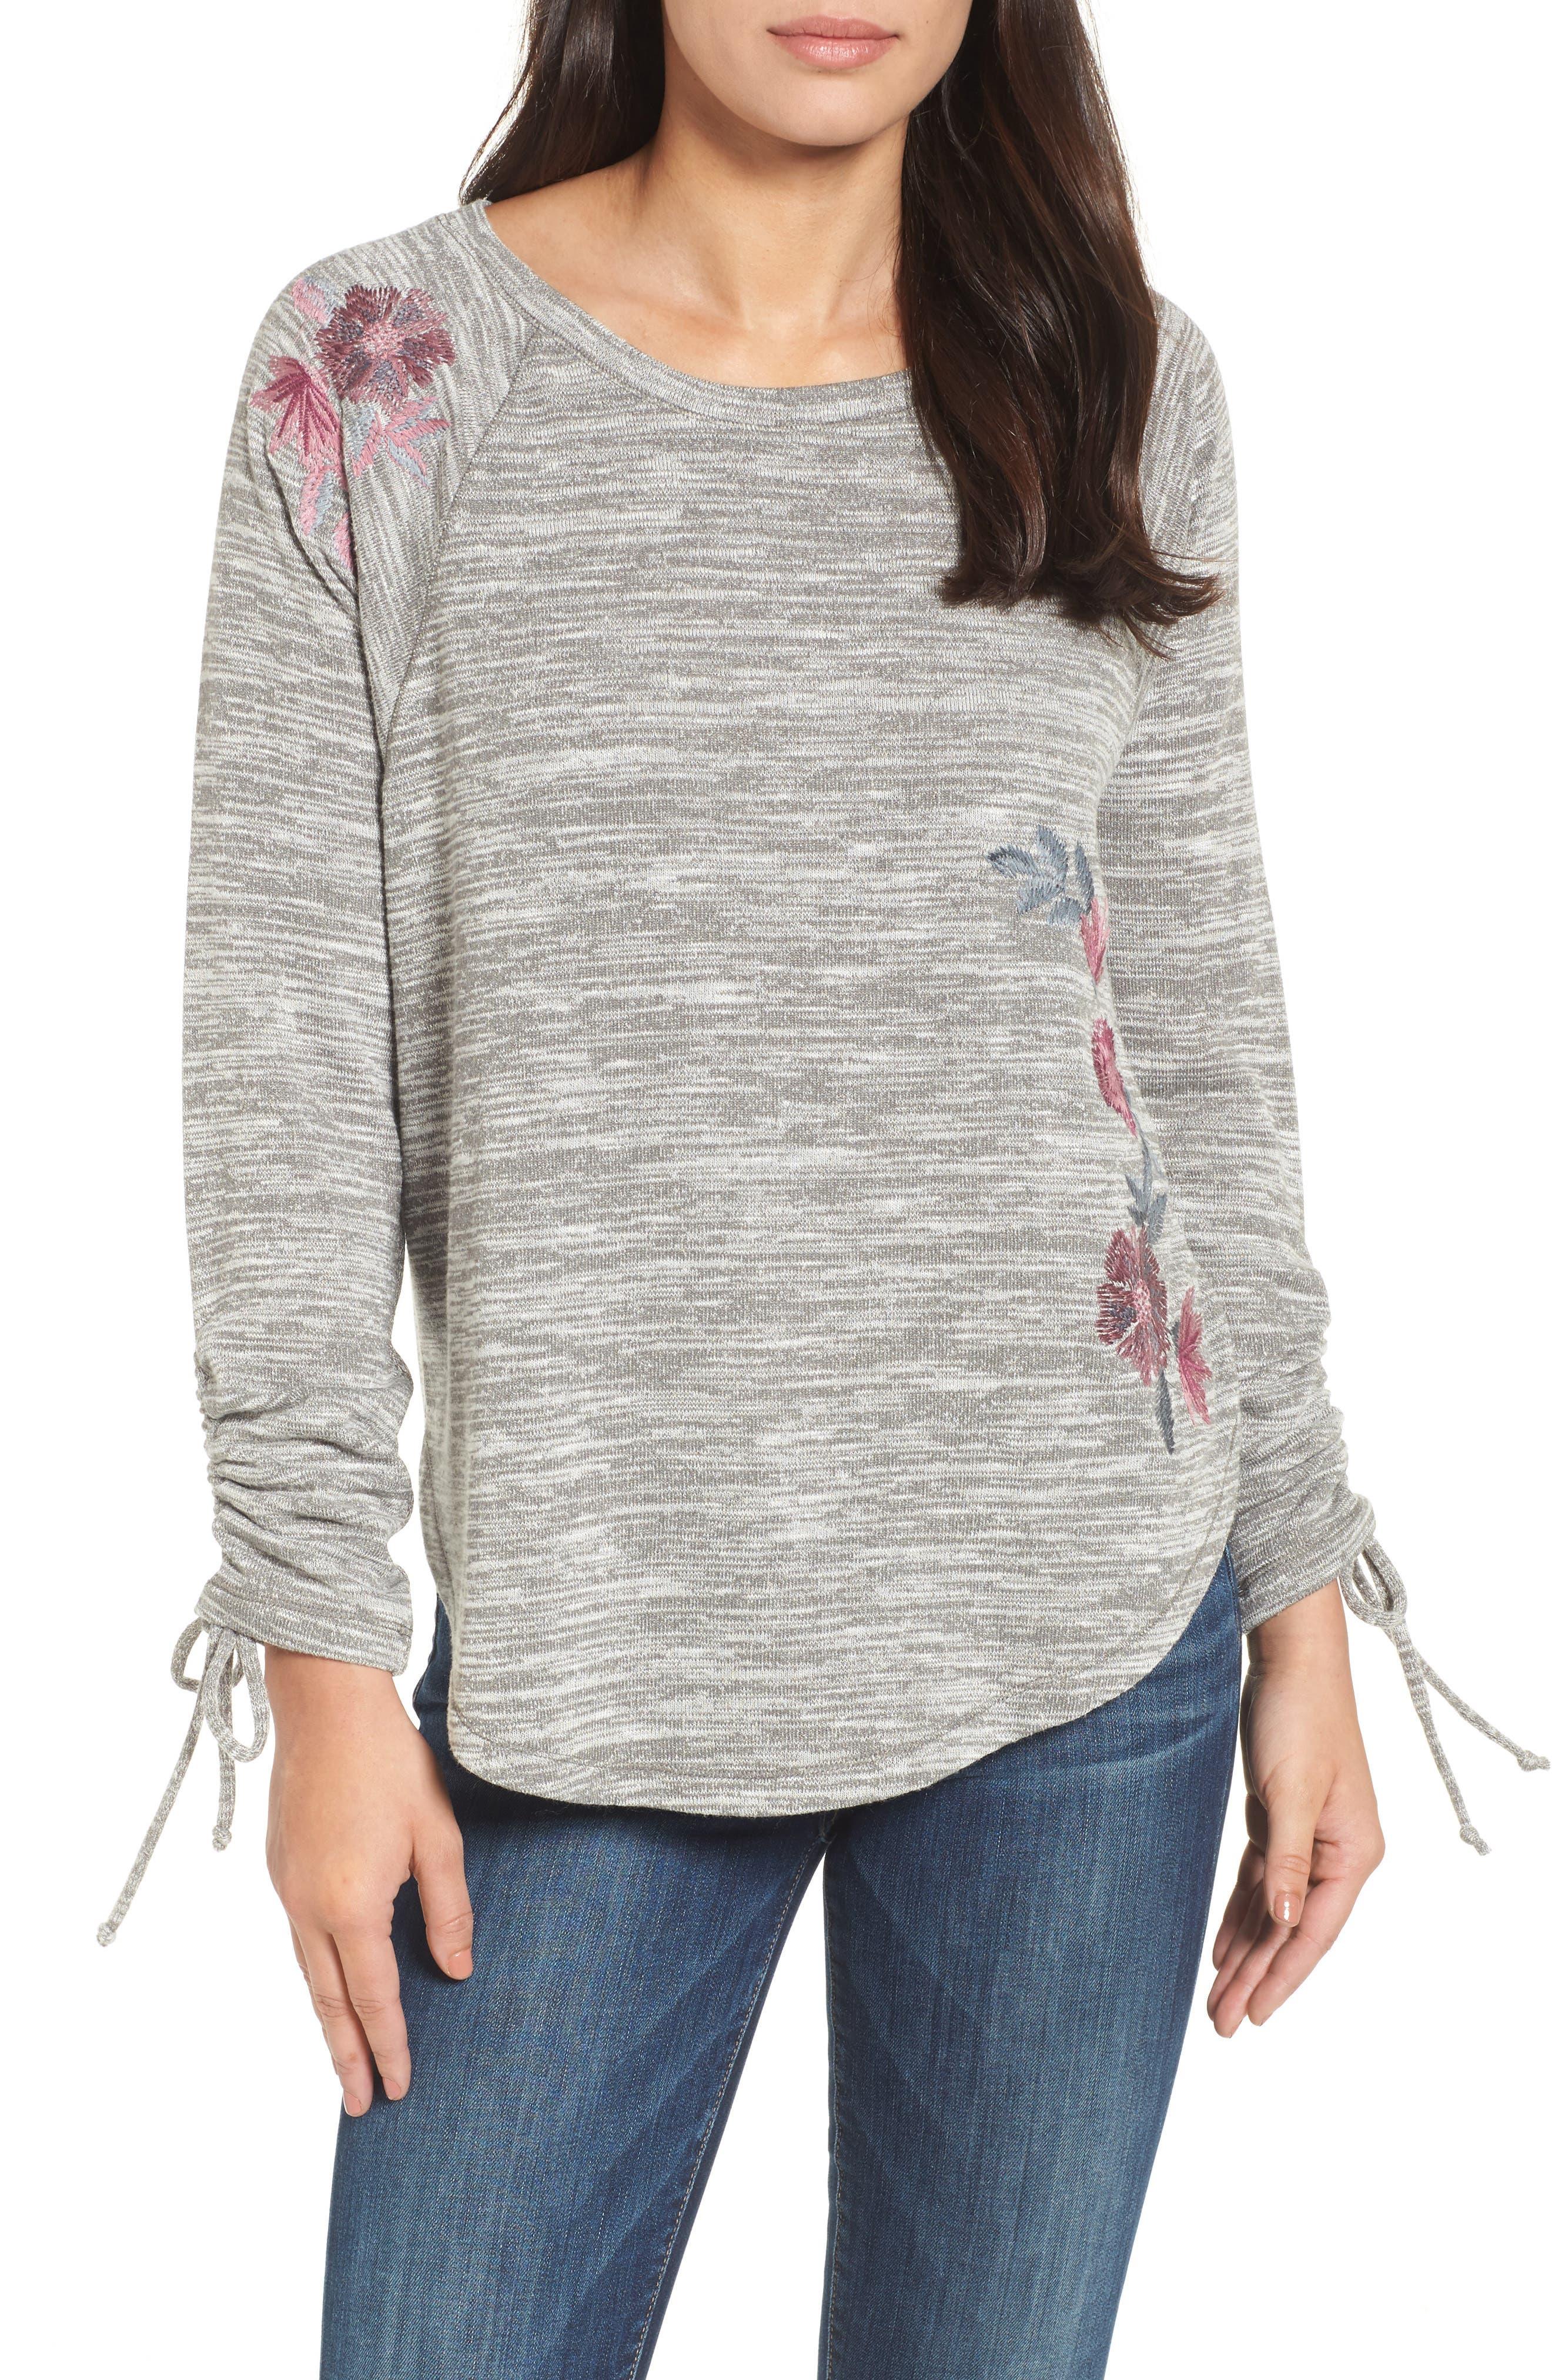 Hacci Embroidered Sweatshirt,                             Main thumbnail 1, color,                             022